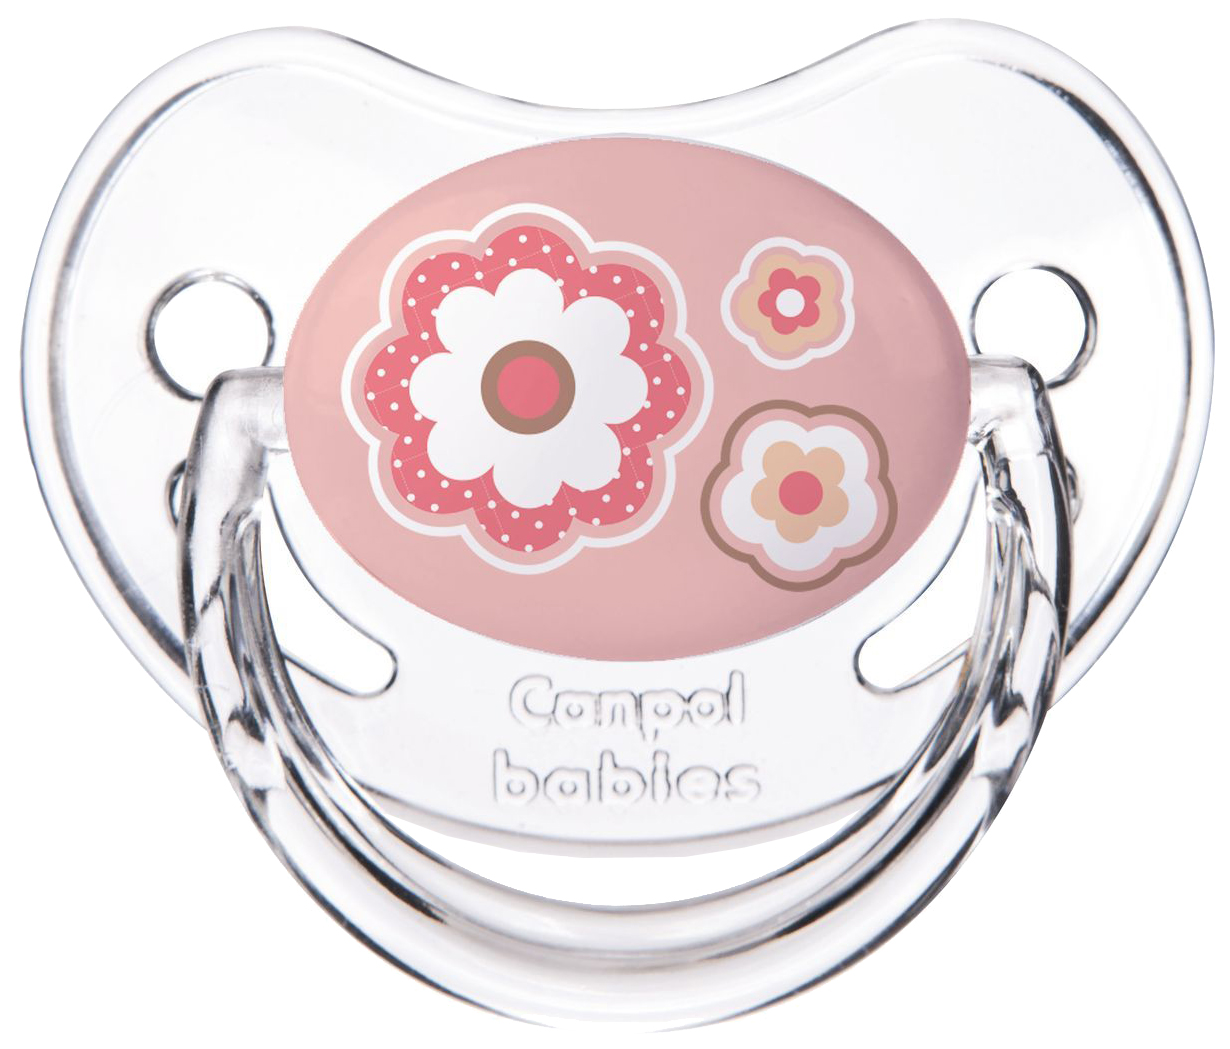 Пустышка Canpol Newborn baby симметричная, силикон, 0-6 мес., арт. 22/580 цвет розовый